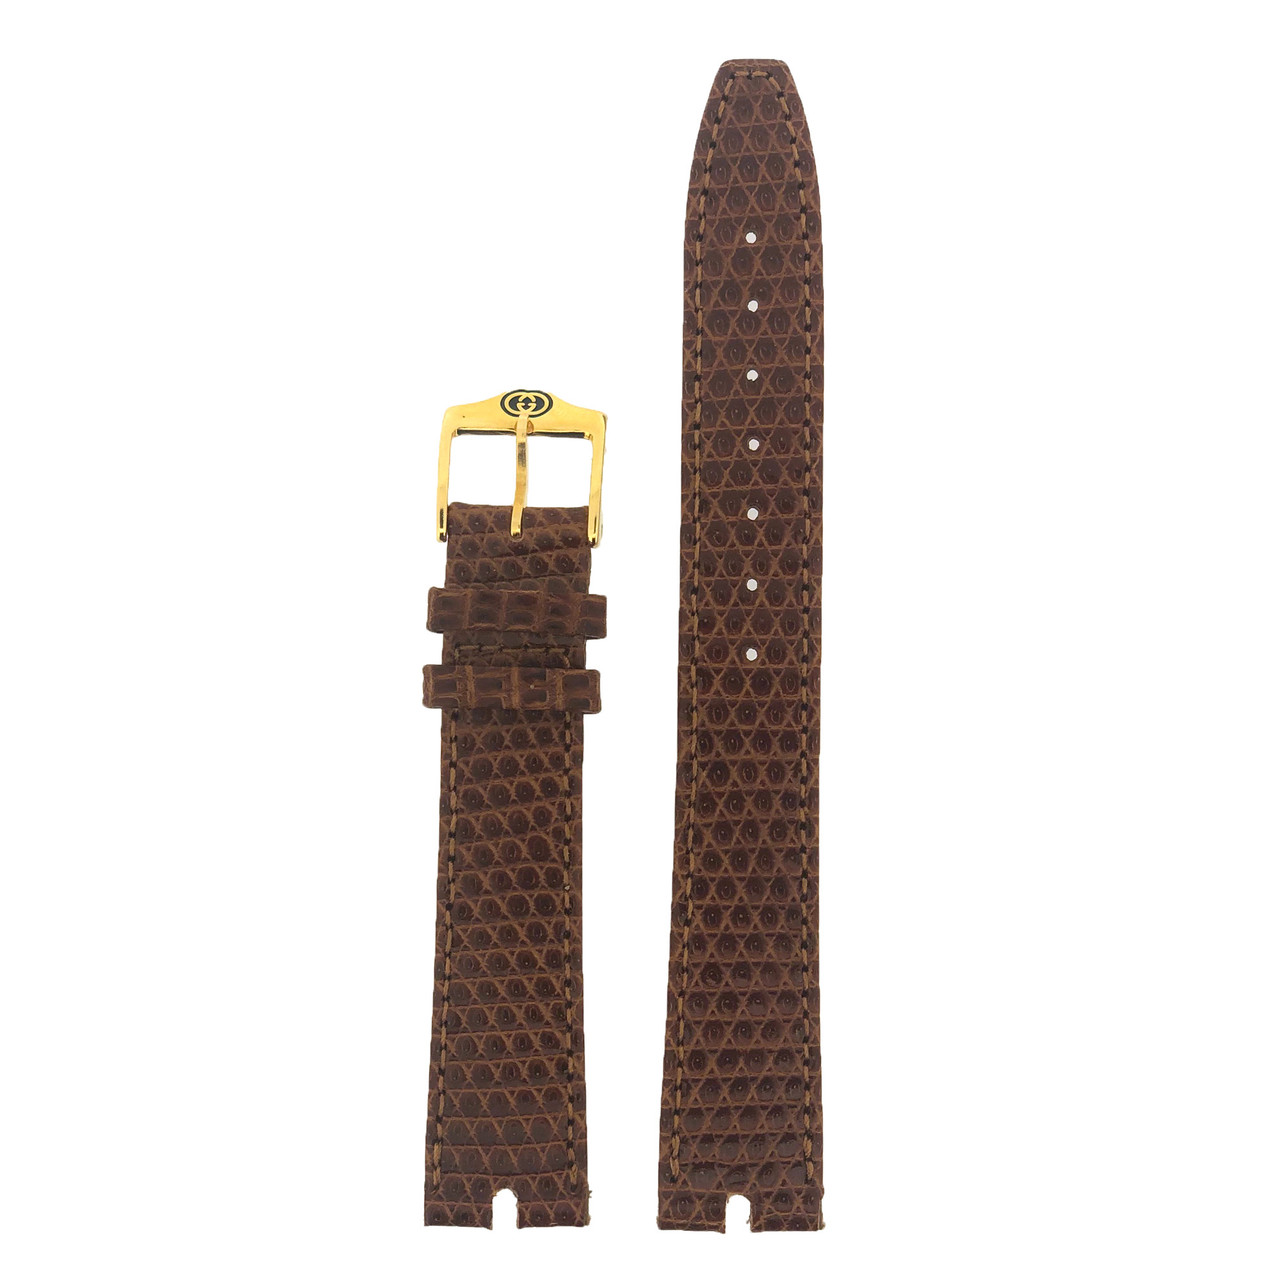 Gucci Watch Band 16mm Light Brown model 2000M - Main